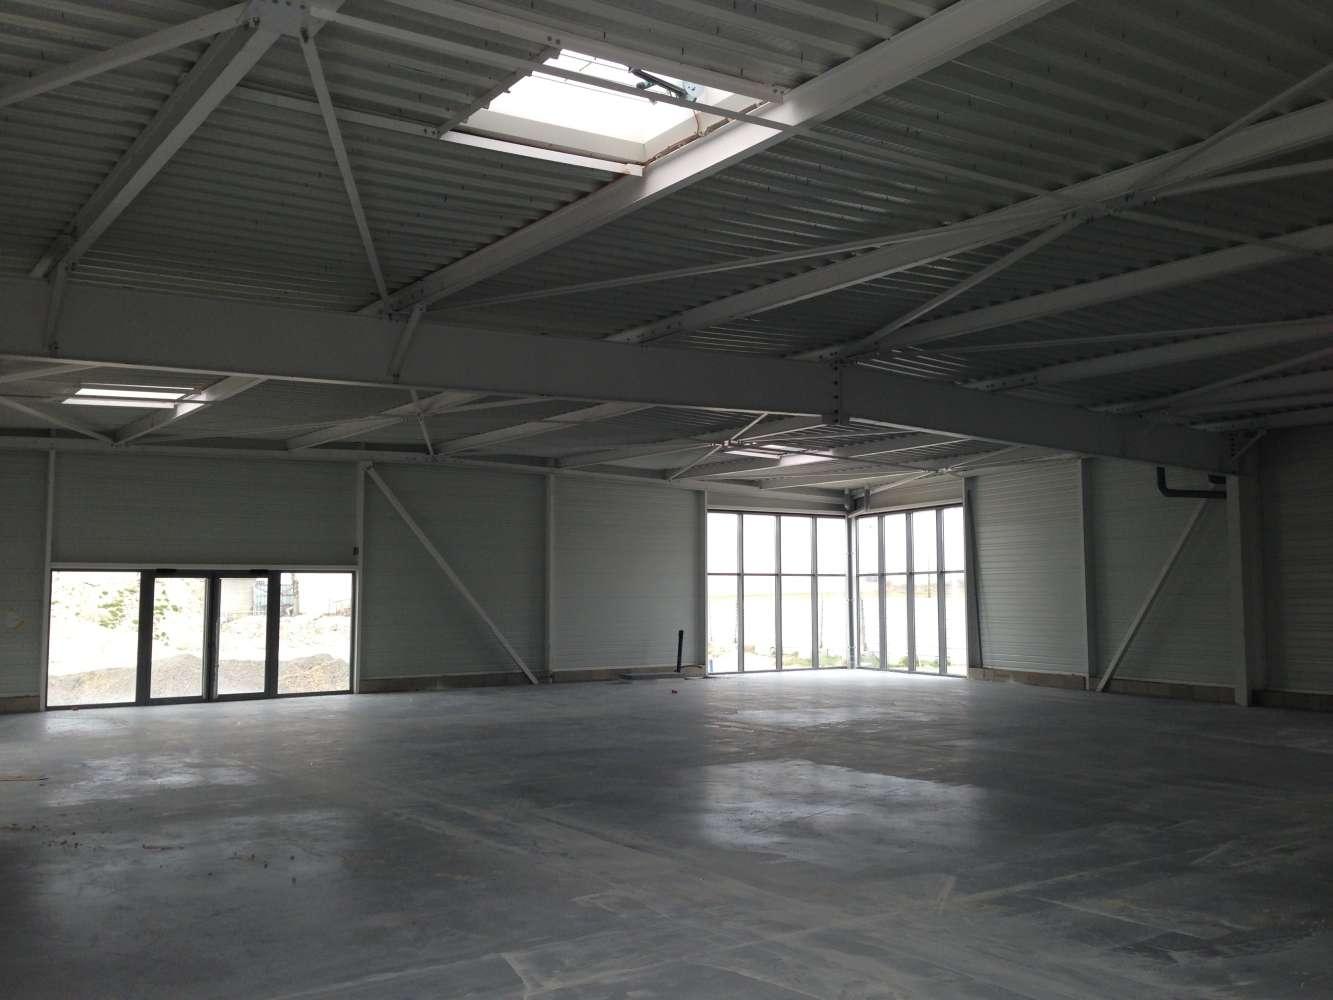 Activités/entrepôt Reims, 51100 - LES ILÔTS - 488681